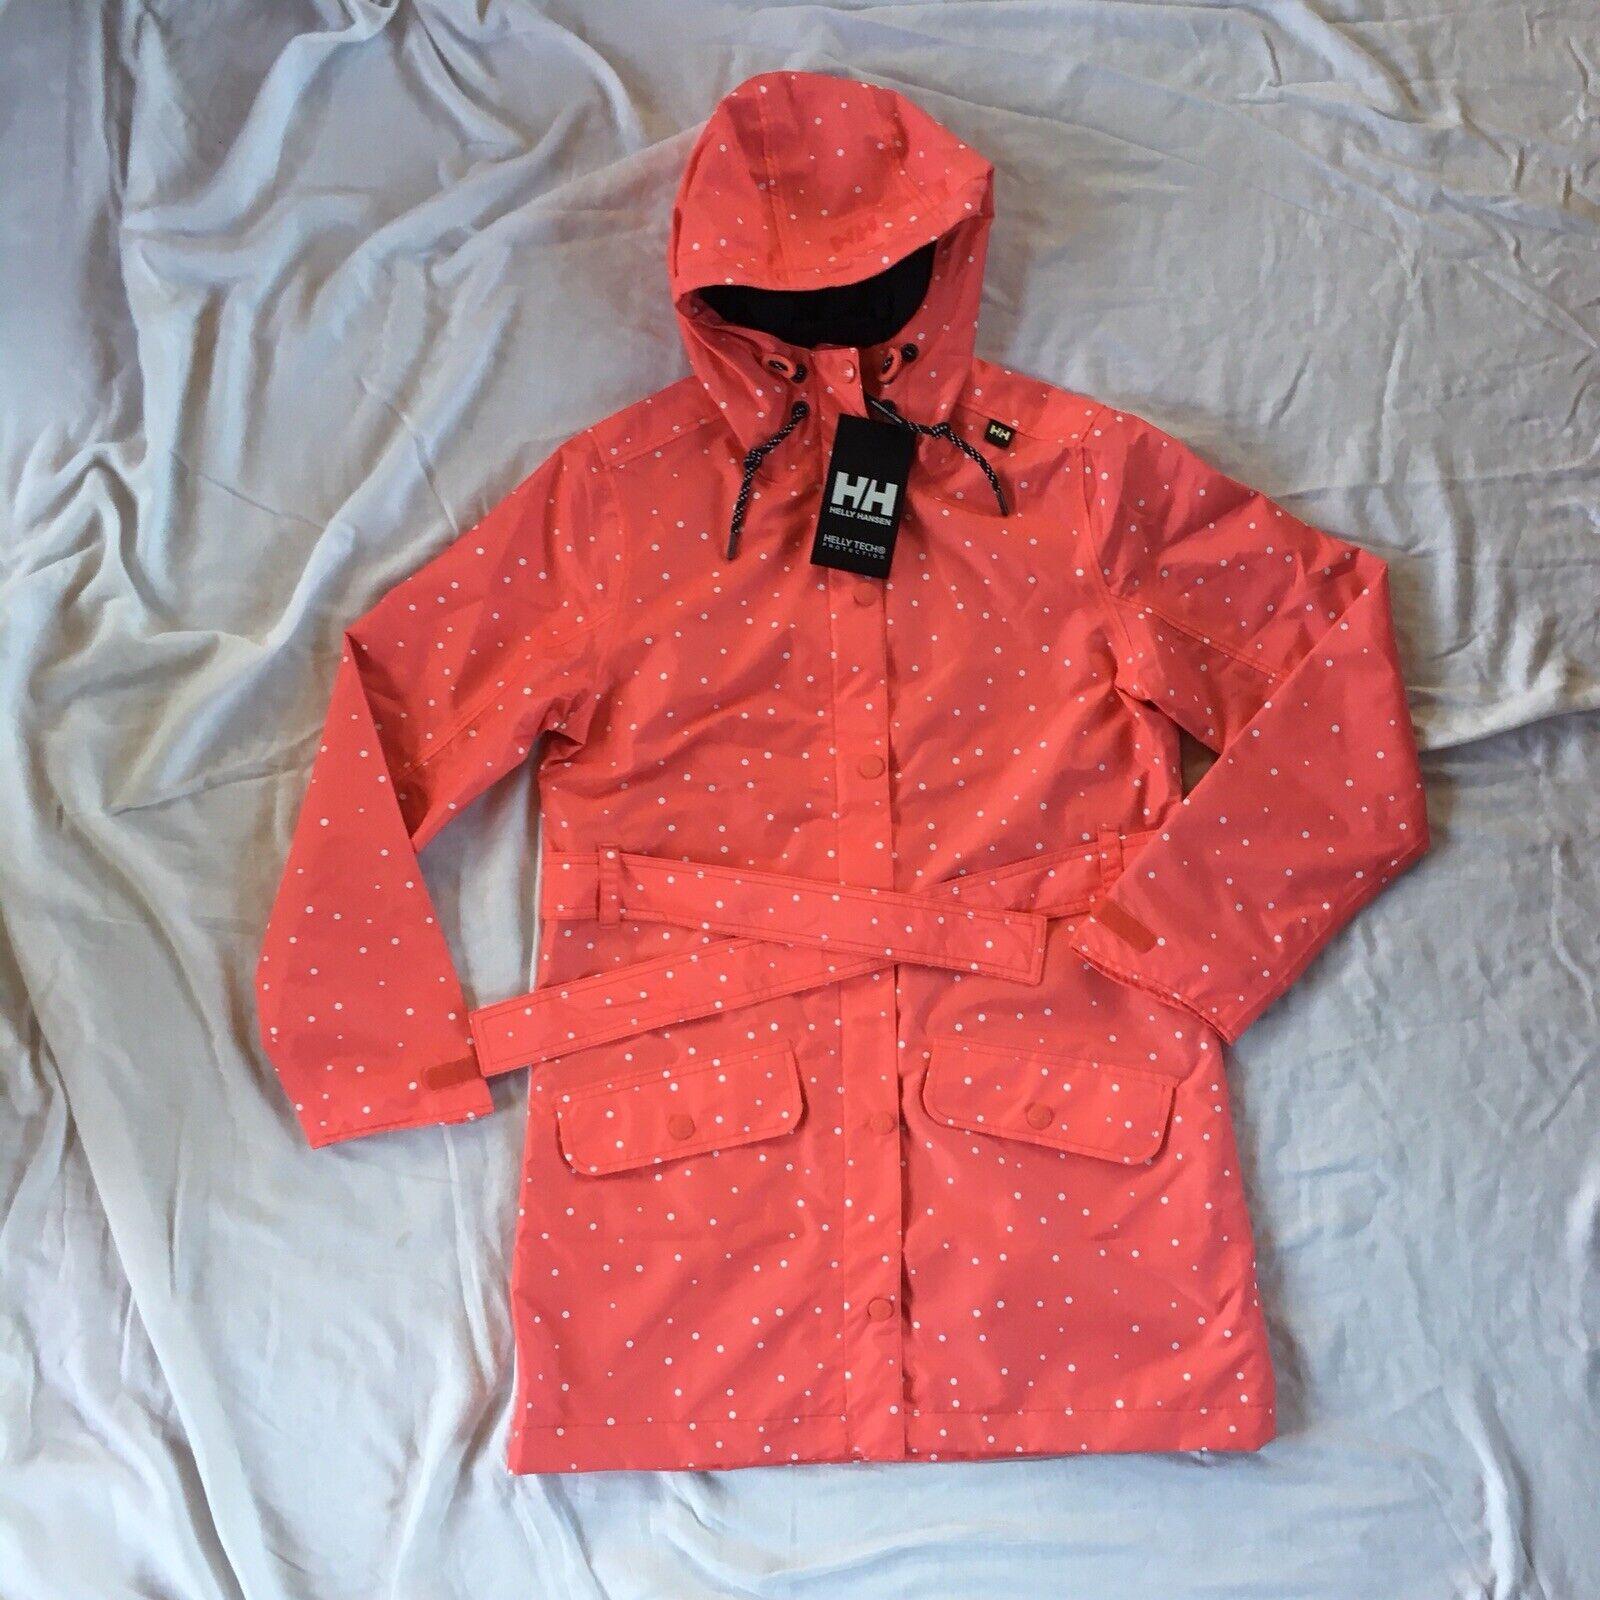 Helly Hansen women's Lyness coat NWT  160 medium coral and white polka dot